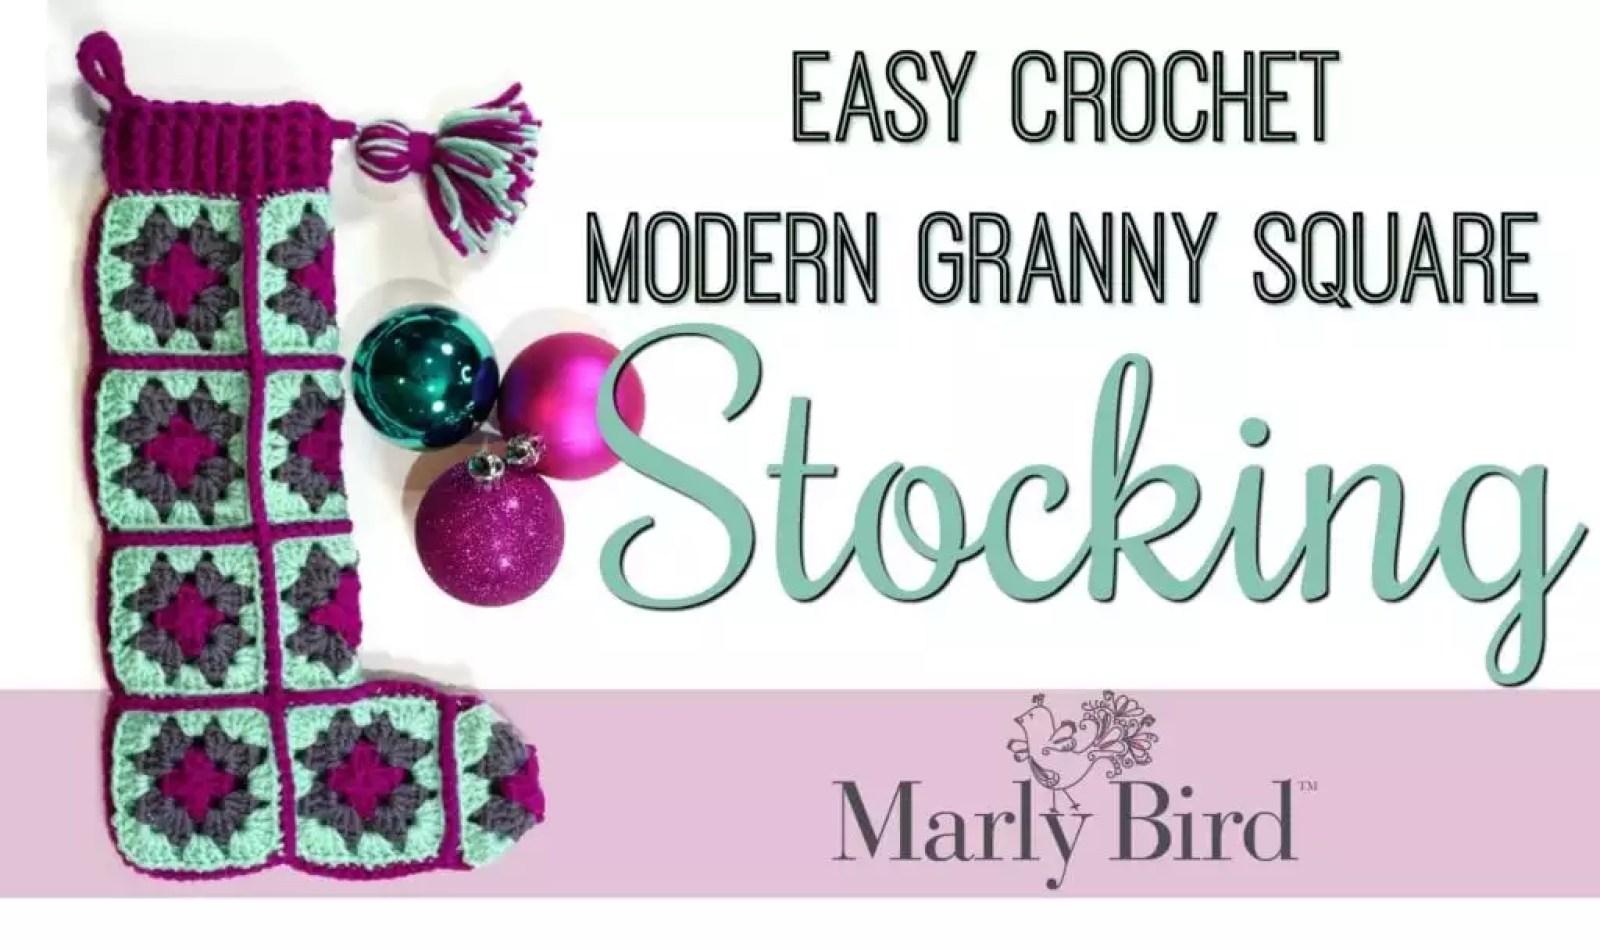 FREE Crochet Pattern Easy Crochet Modern Granny Square Stocking